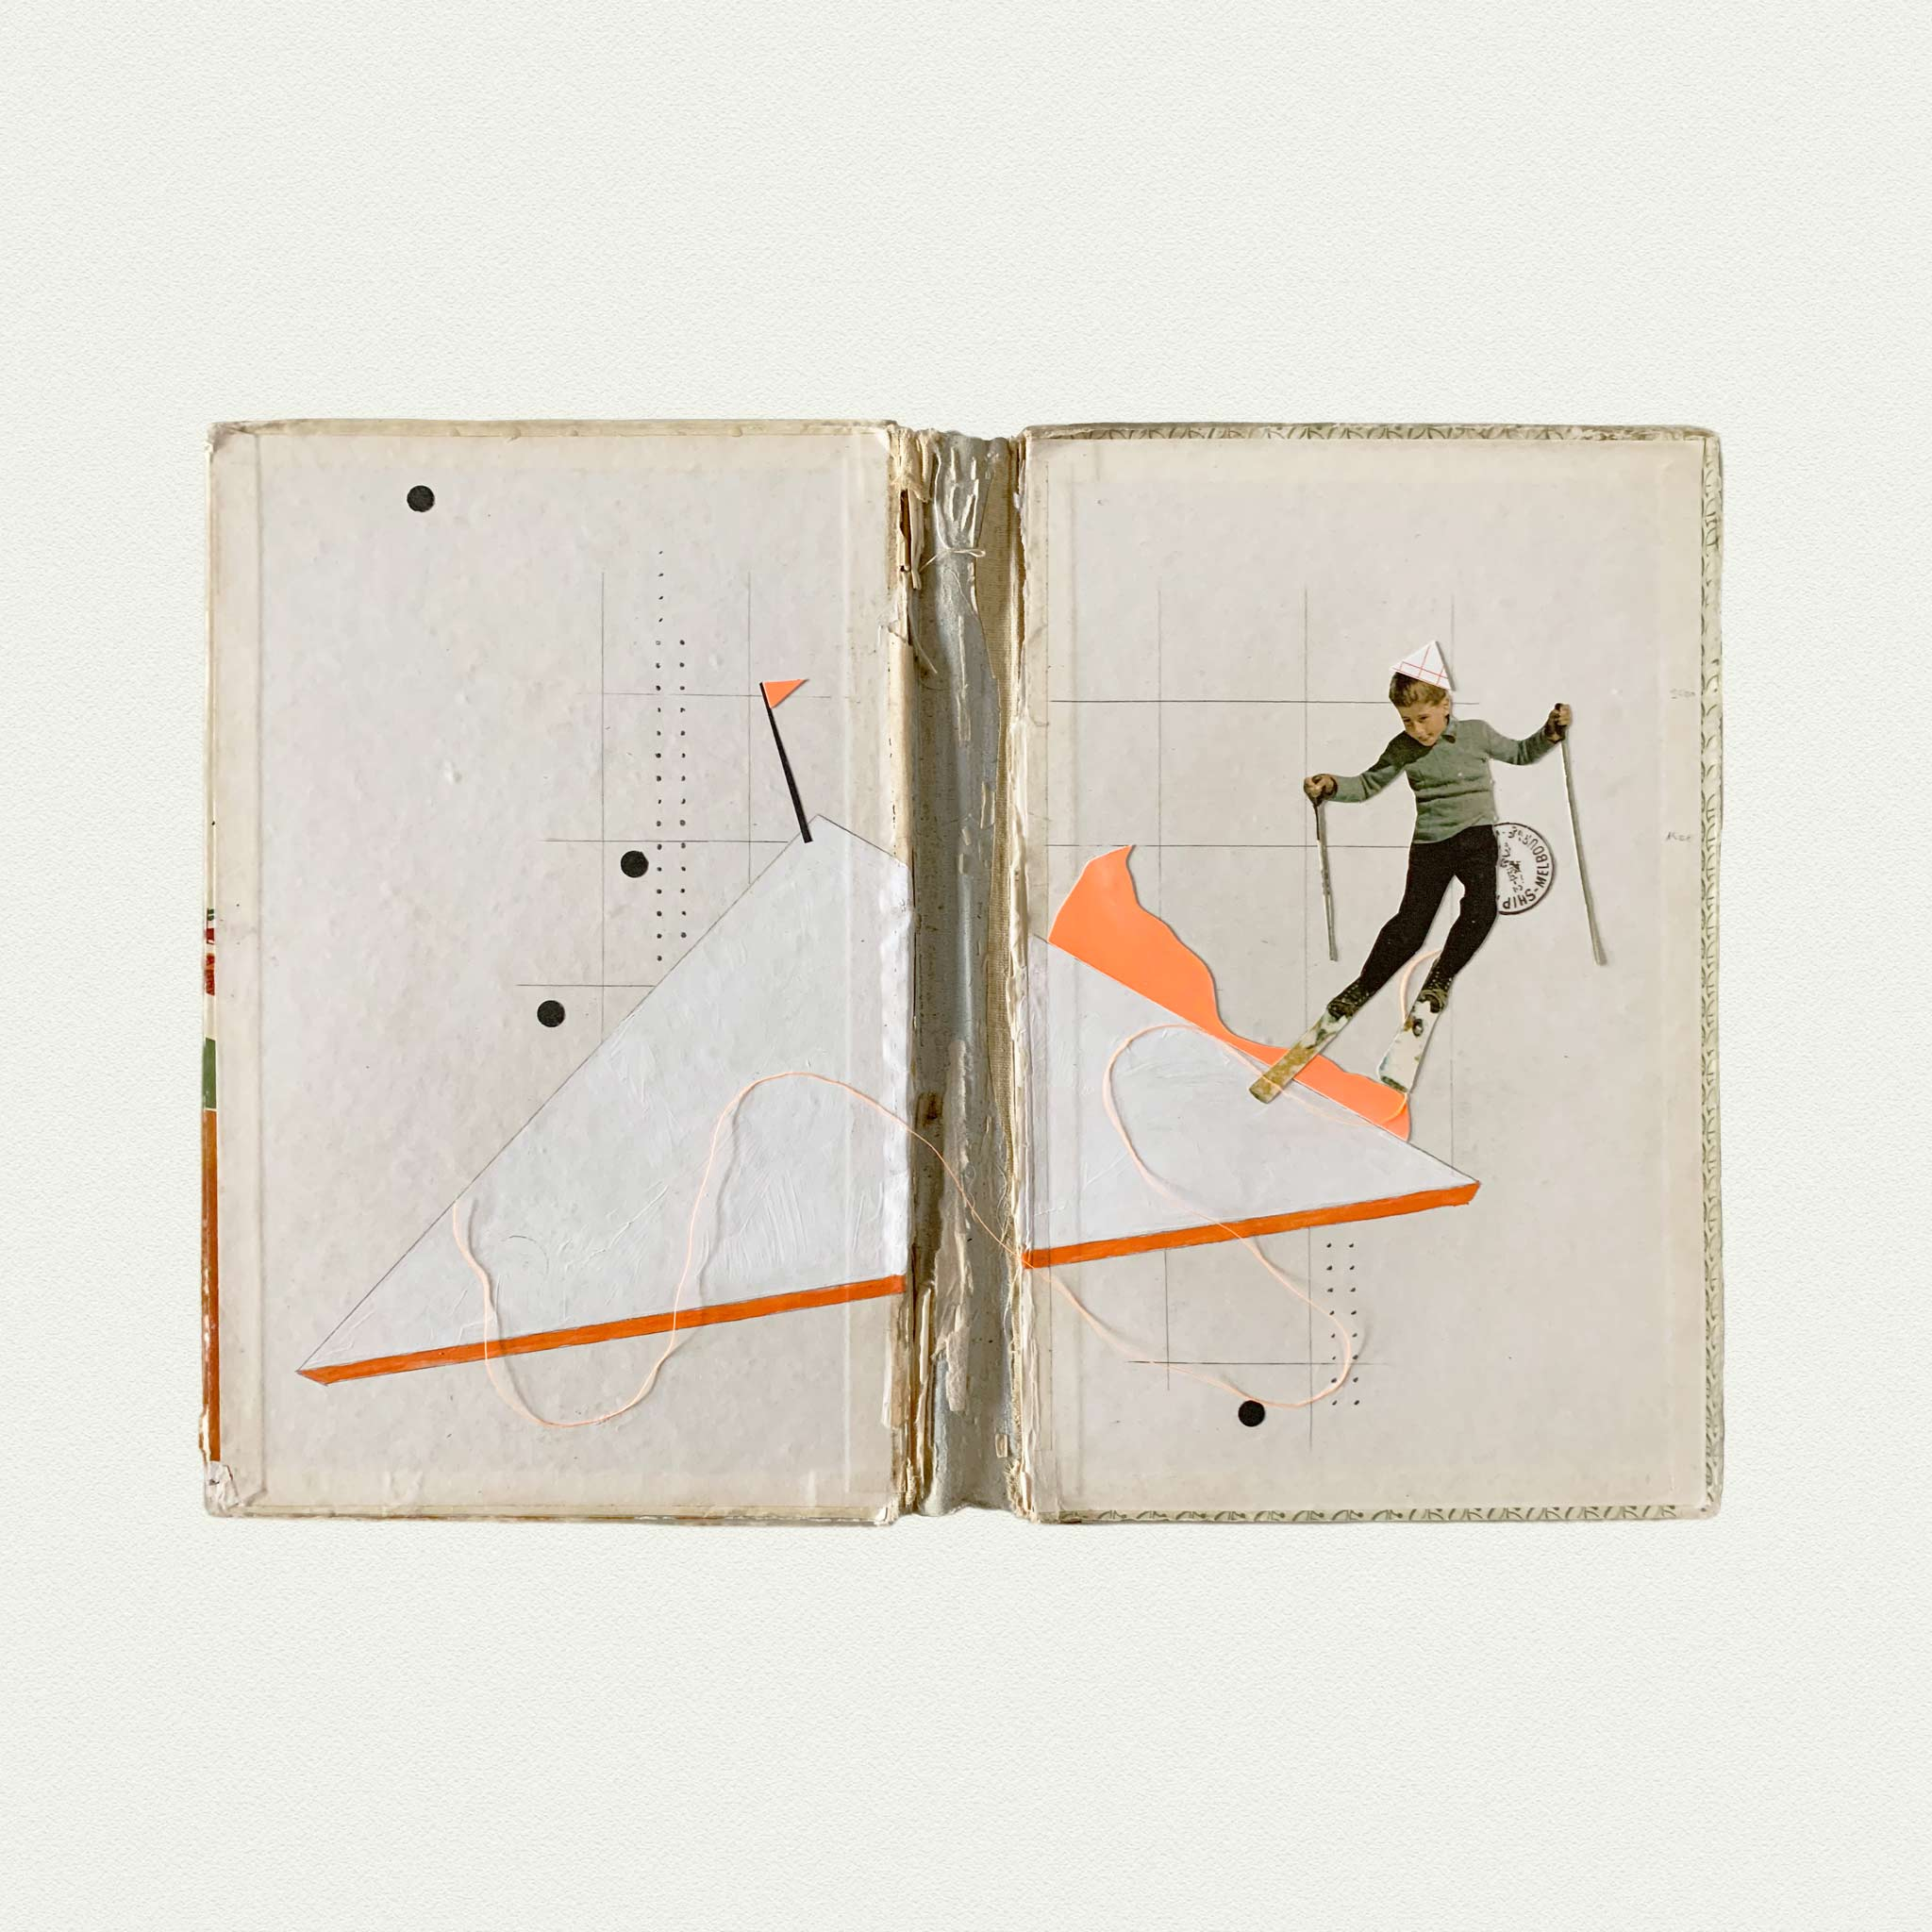 Collage Slalomland #01